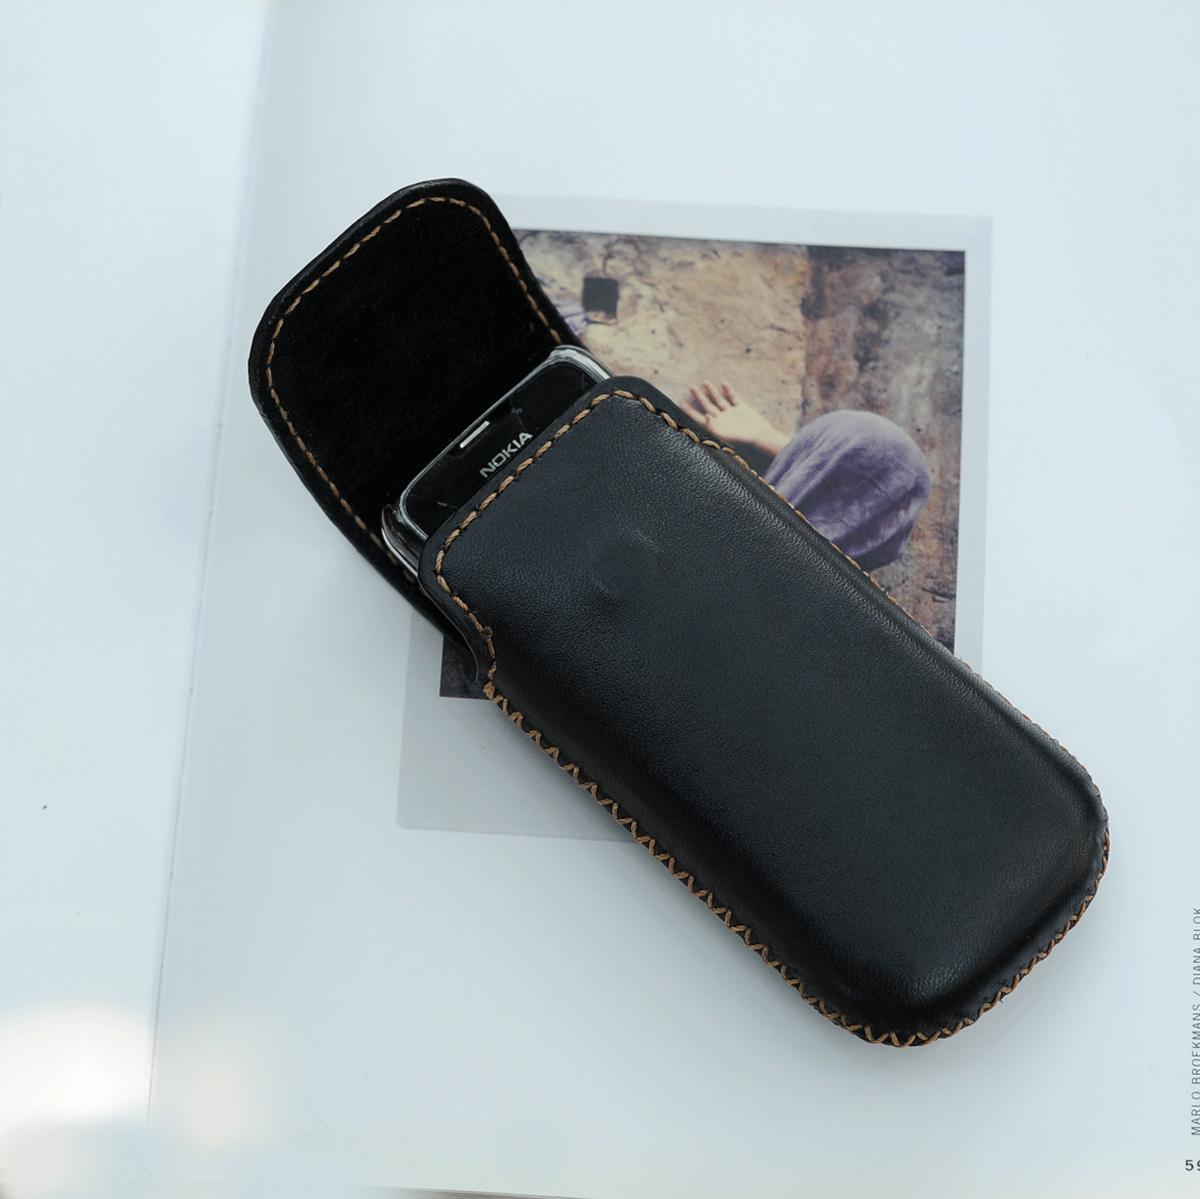 Bao da bò cho điện thoại Nokia 8800 màu đen  - Bao da handmade DT824